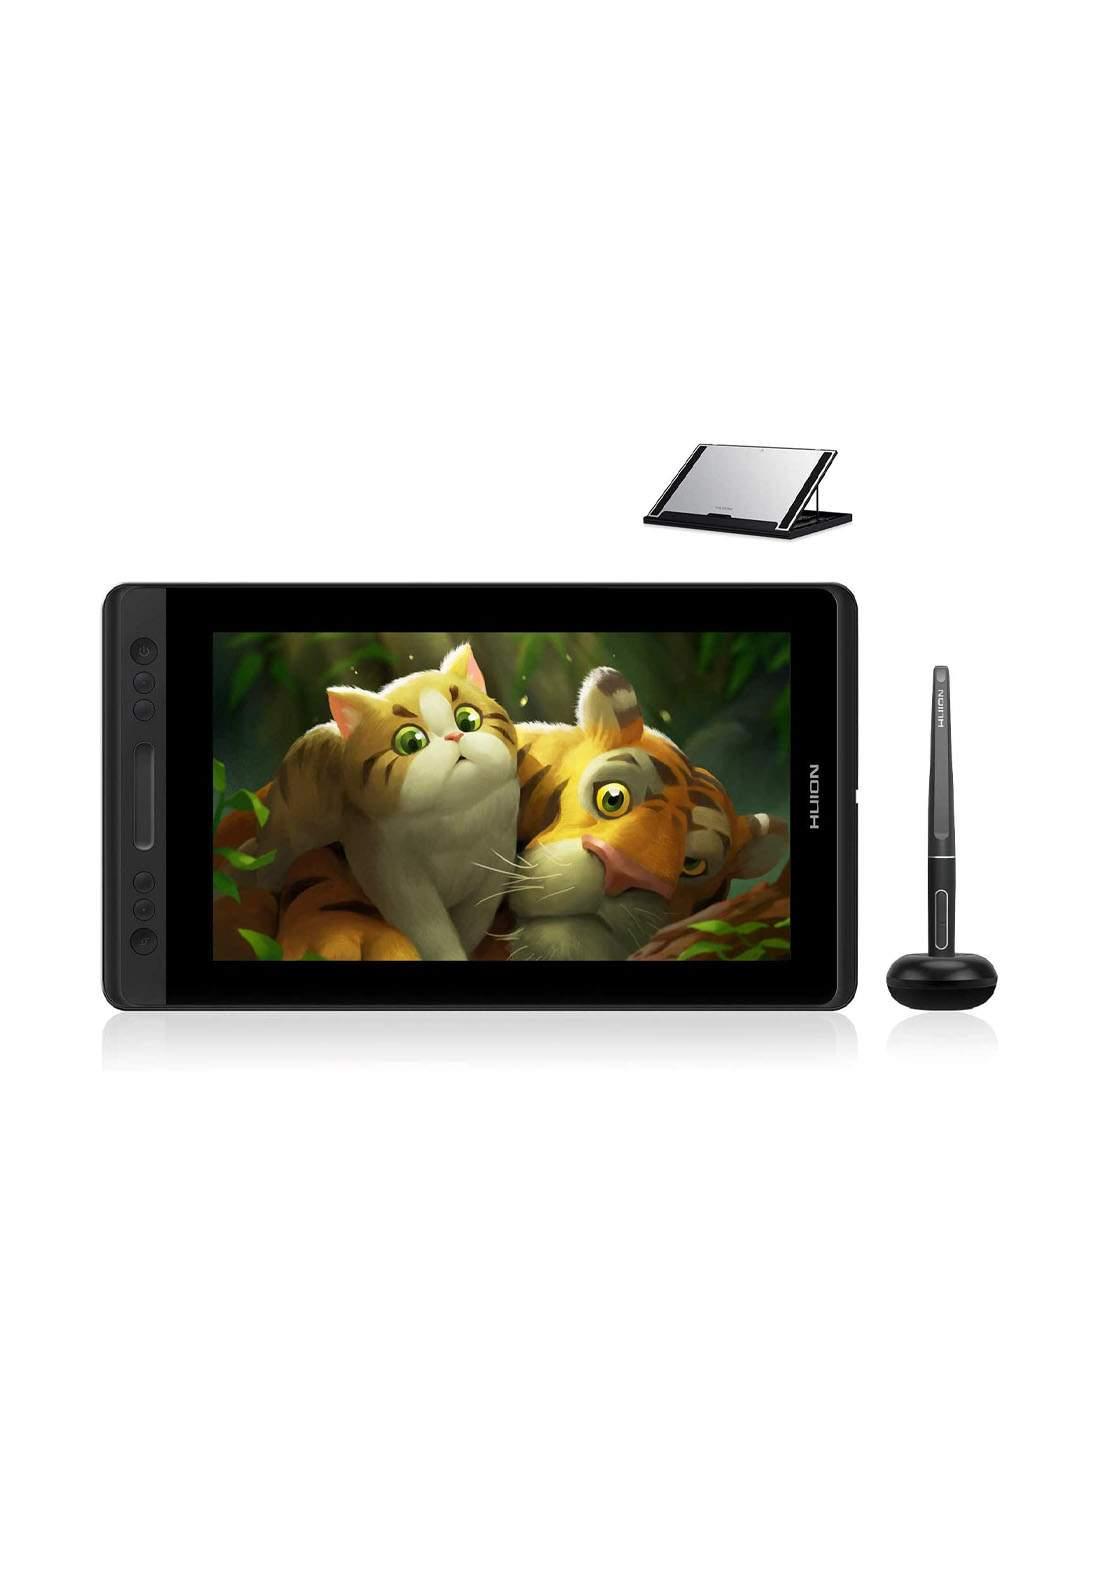 Huion Kamvas Pro 13  Display Drawing Monitor Battery-Free تابلت رسم وكتابة